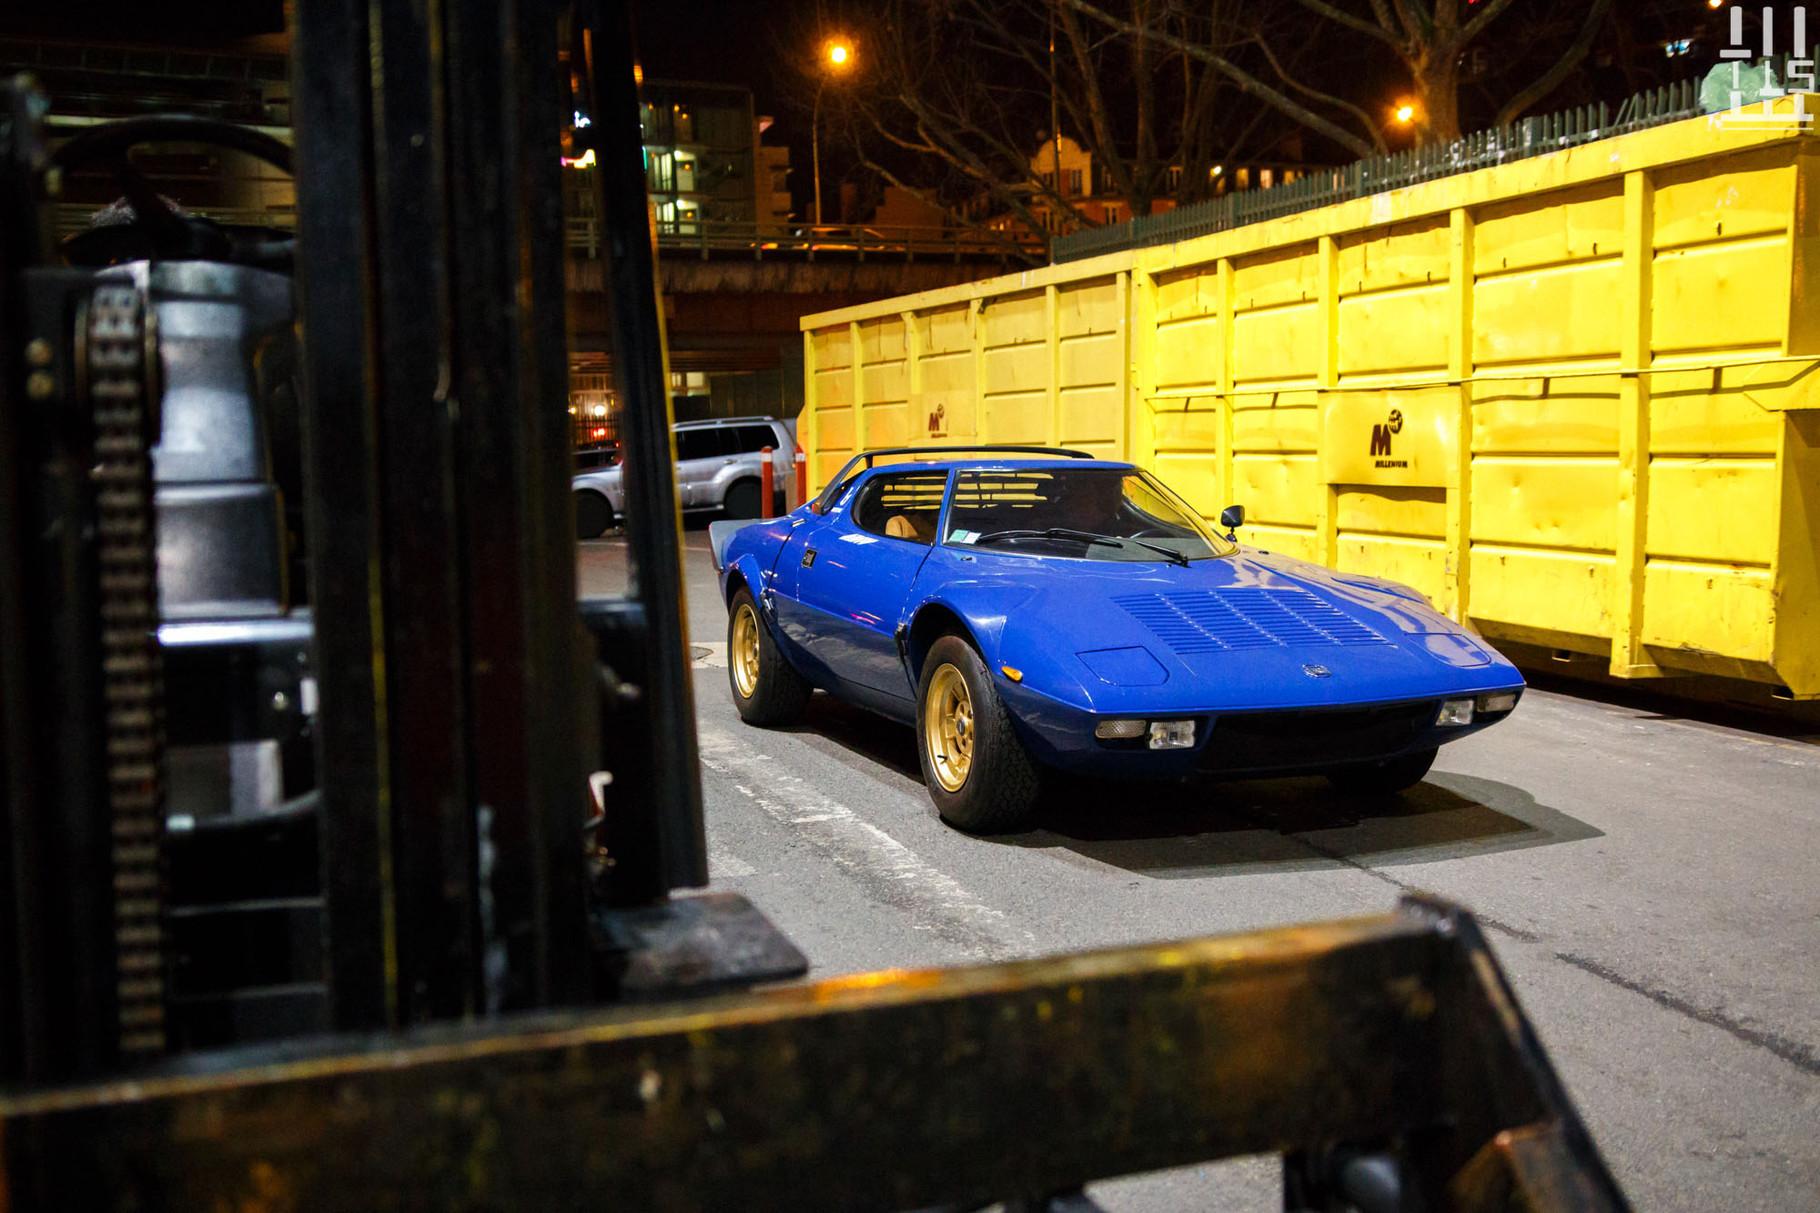 Resplendissante Lancia Stratos.